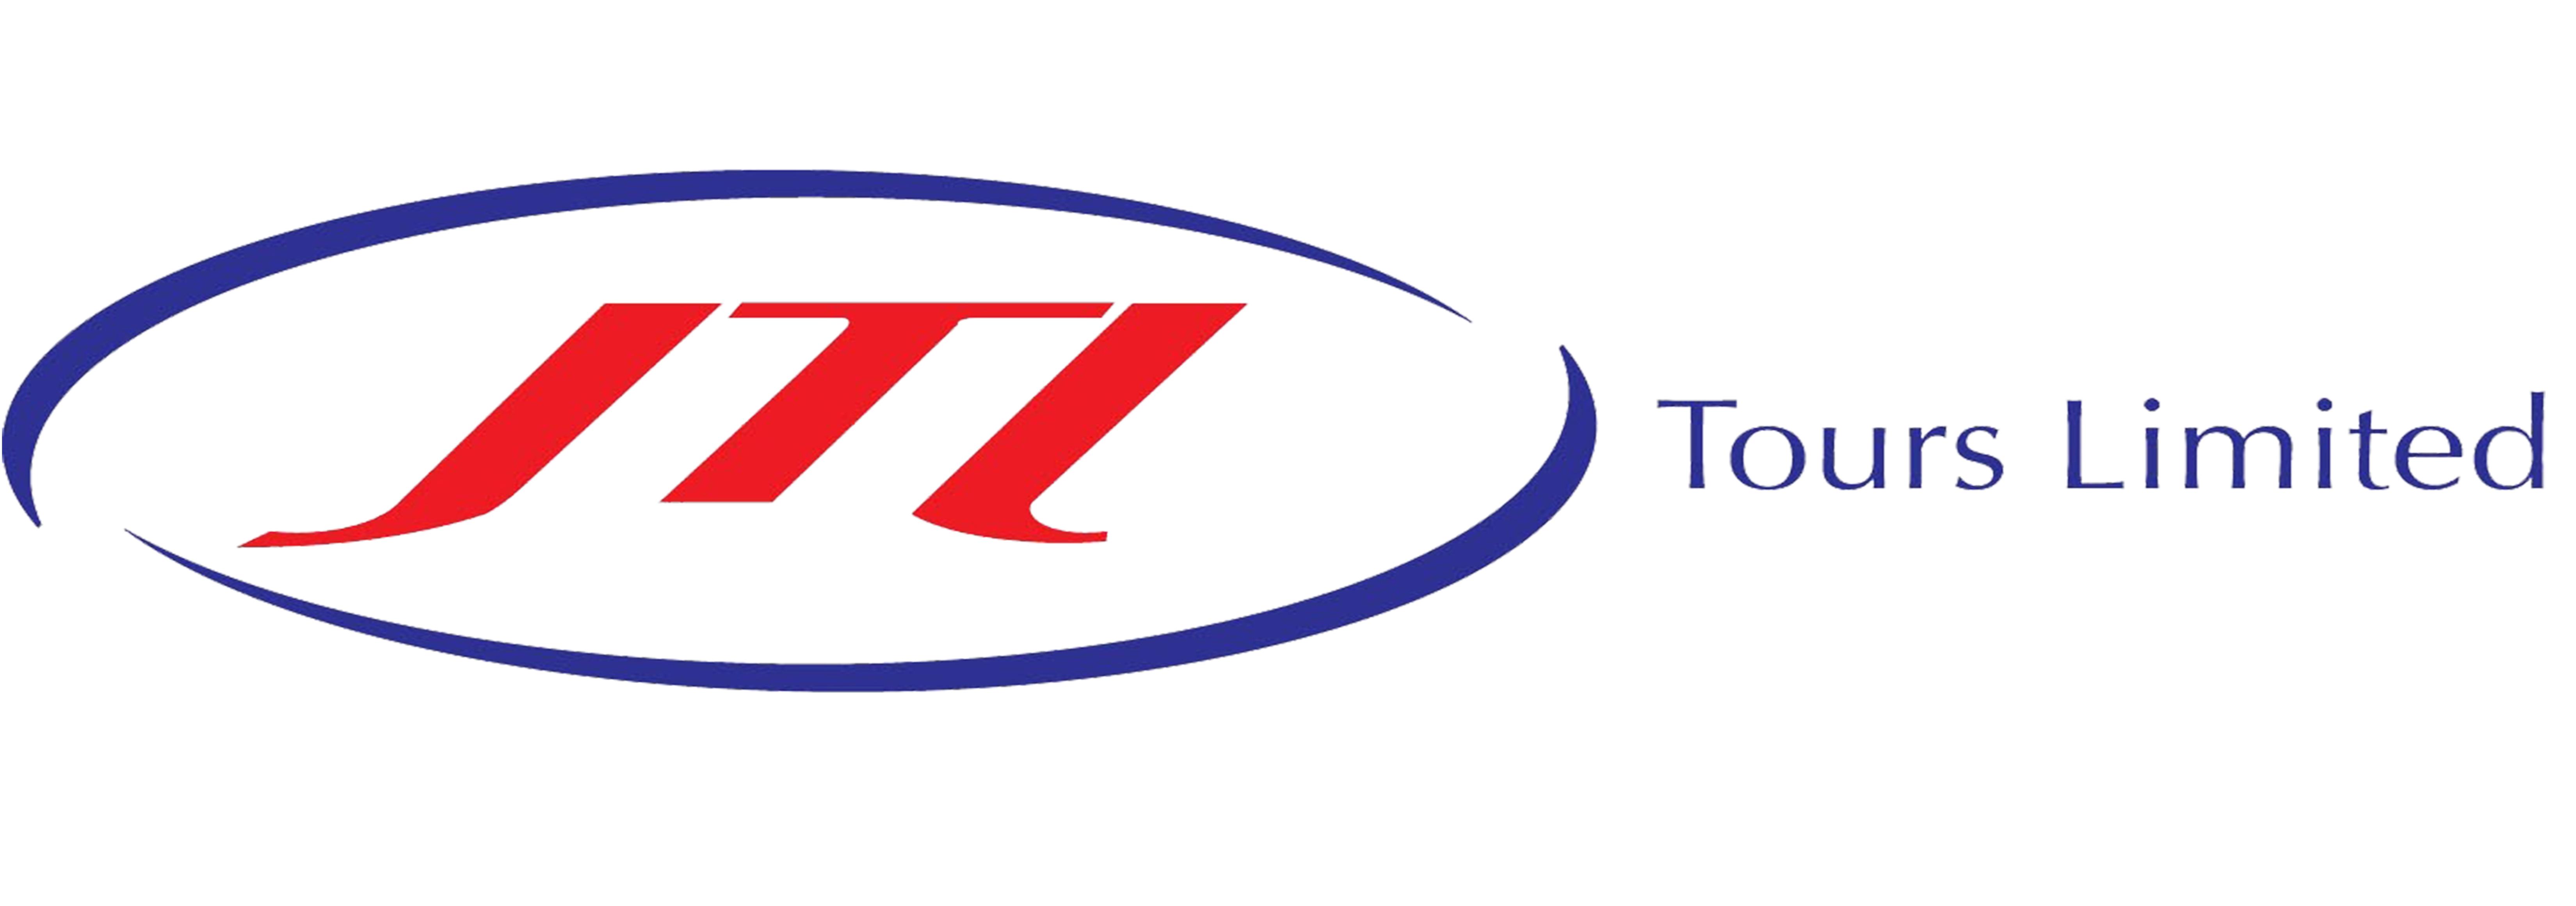 JTL Tours Limited logo.